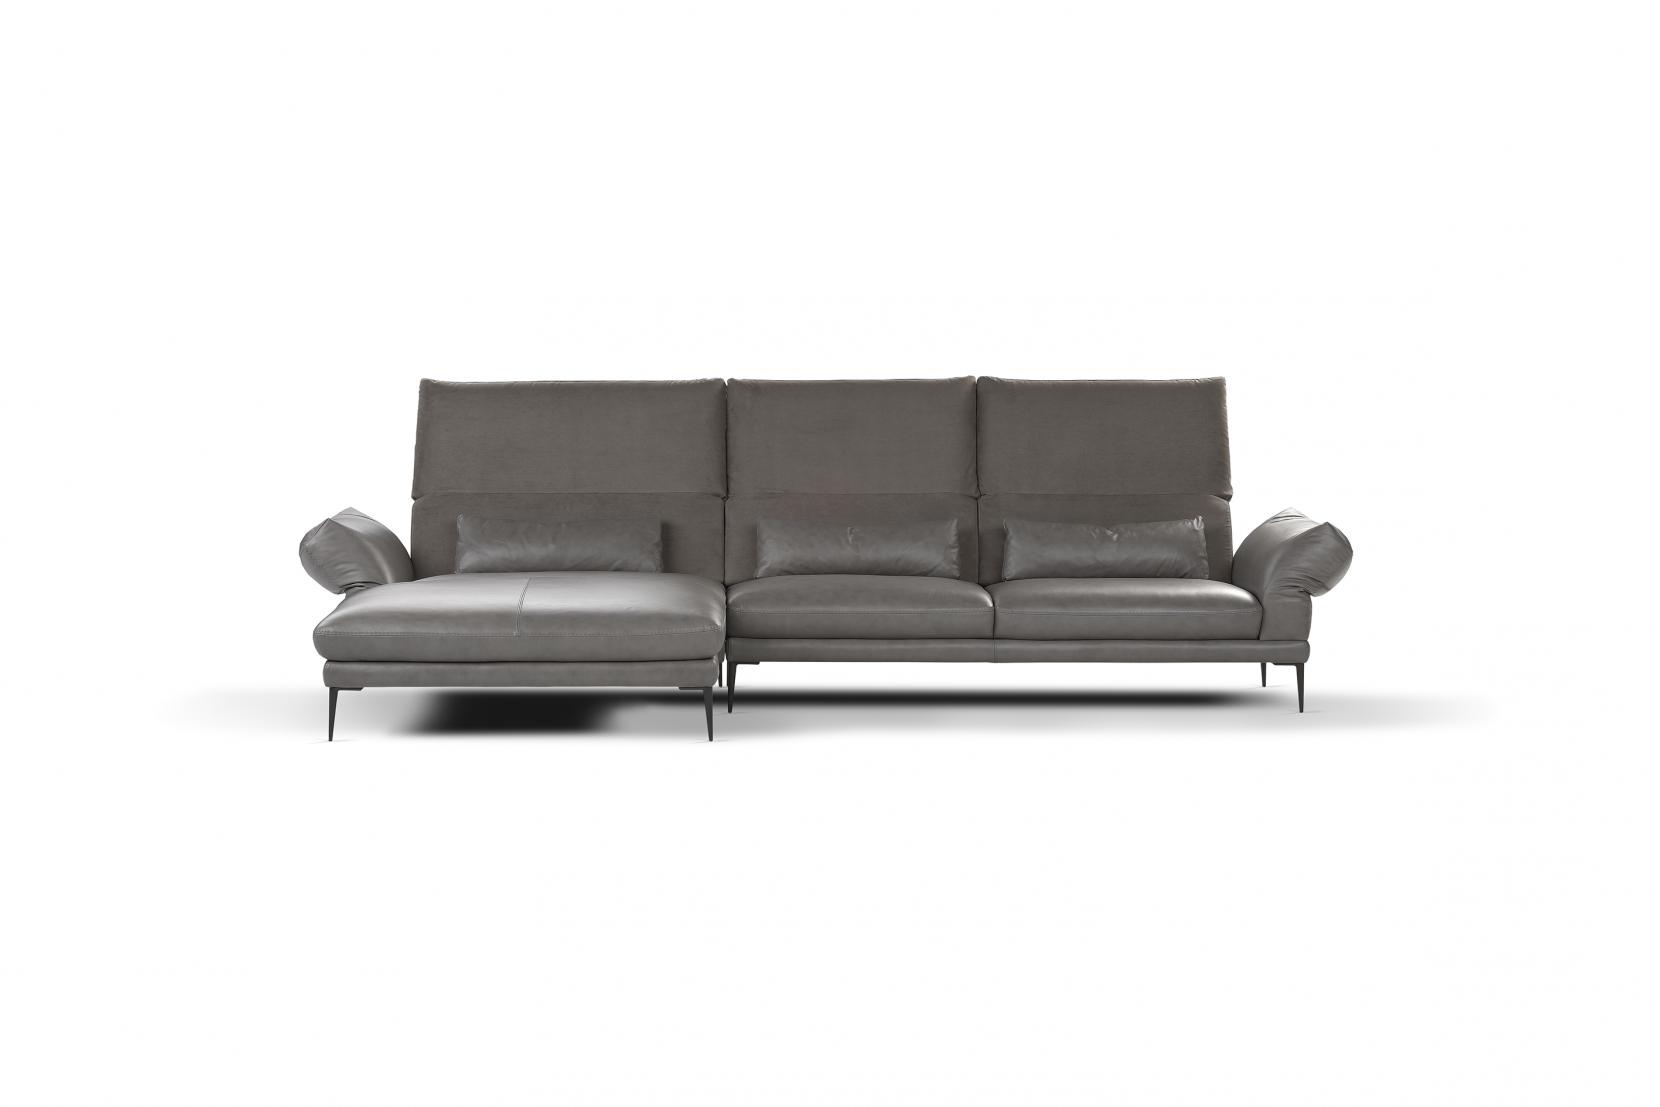 Priya Handmade Italian Luxury 2 Seater 3 Seater Sofas And Sets Italian Sofa Sofa Italian Luxury Sofa